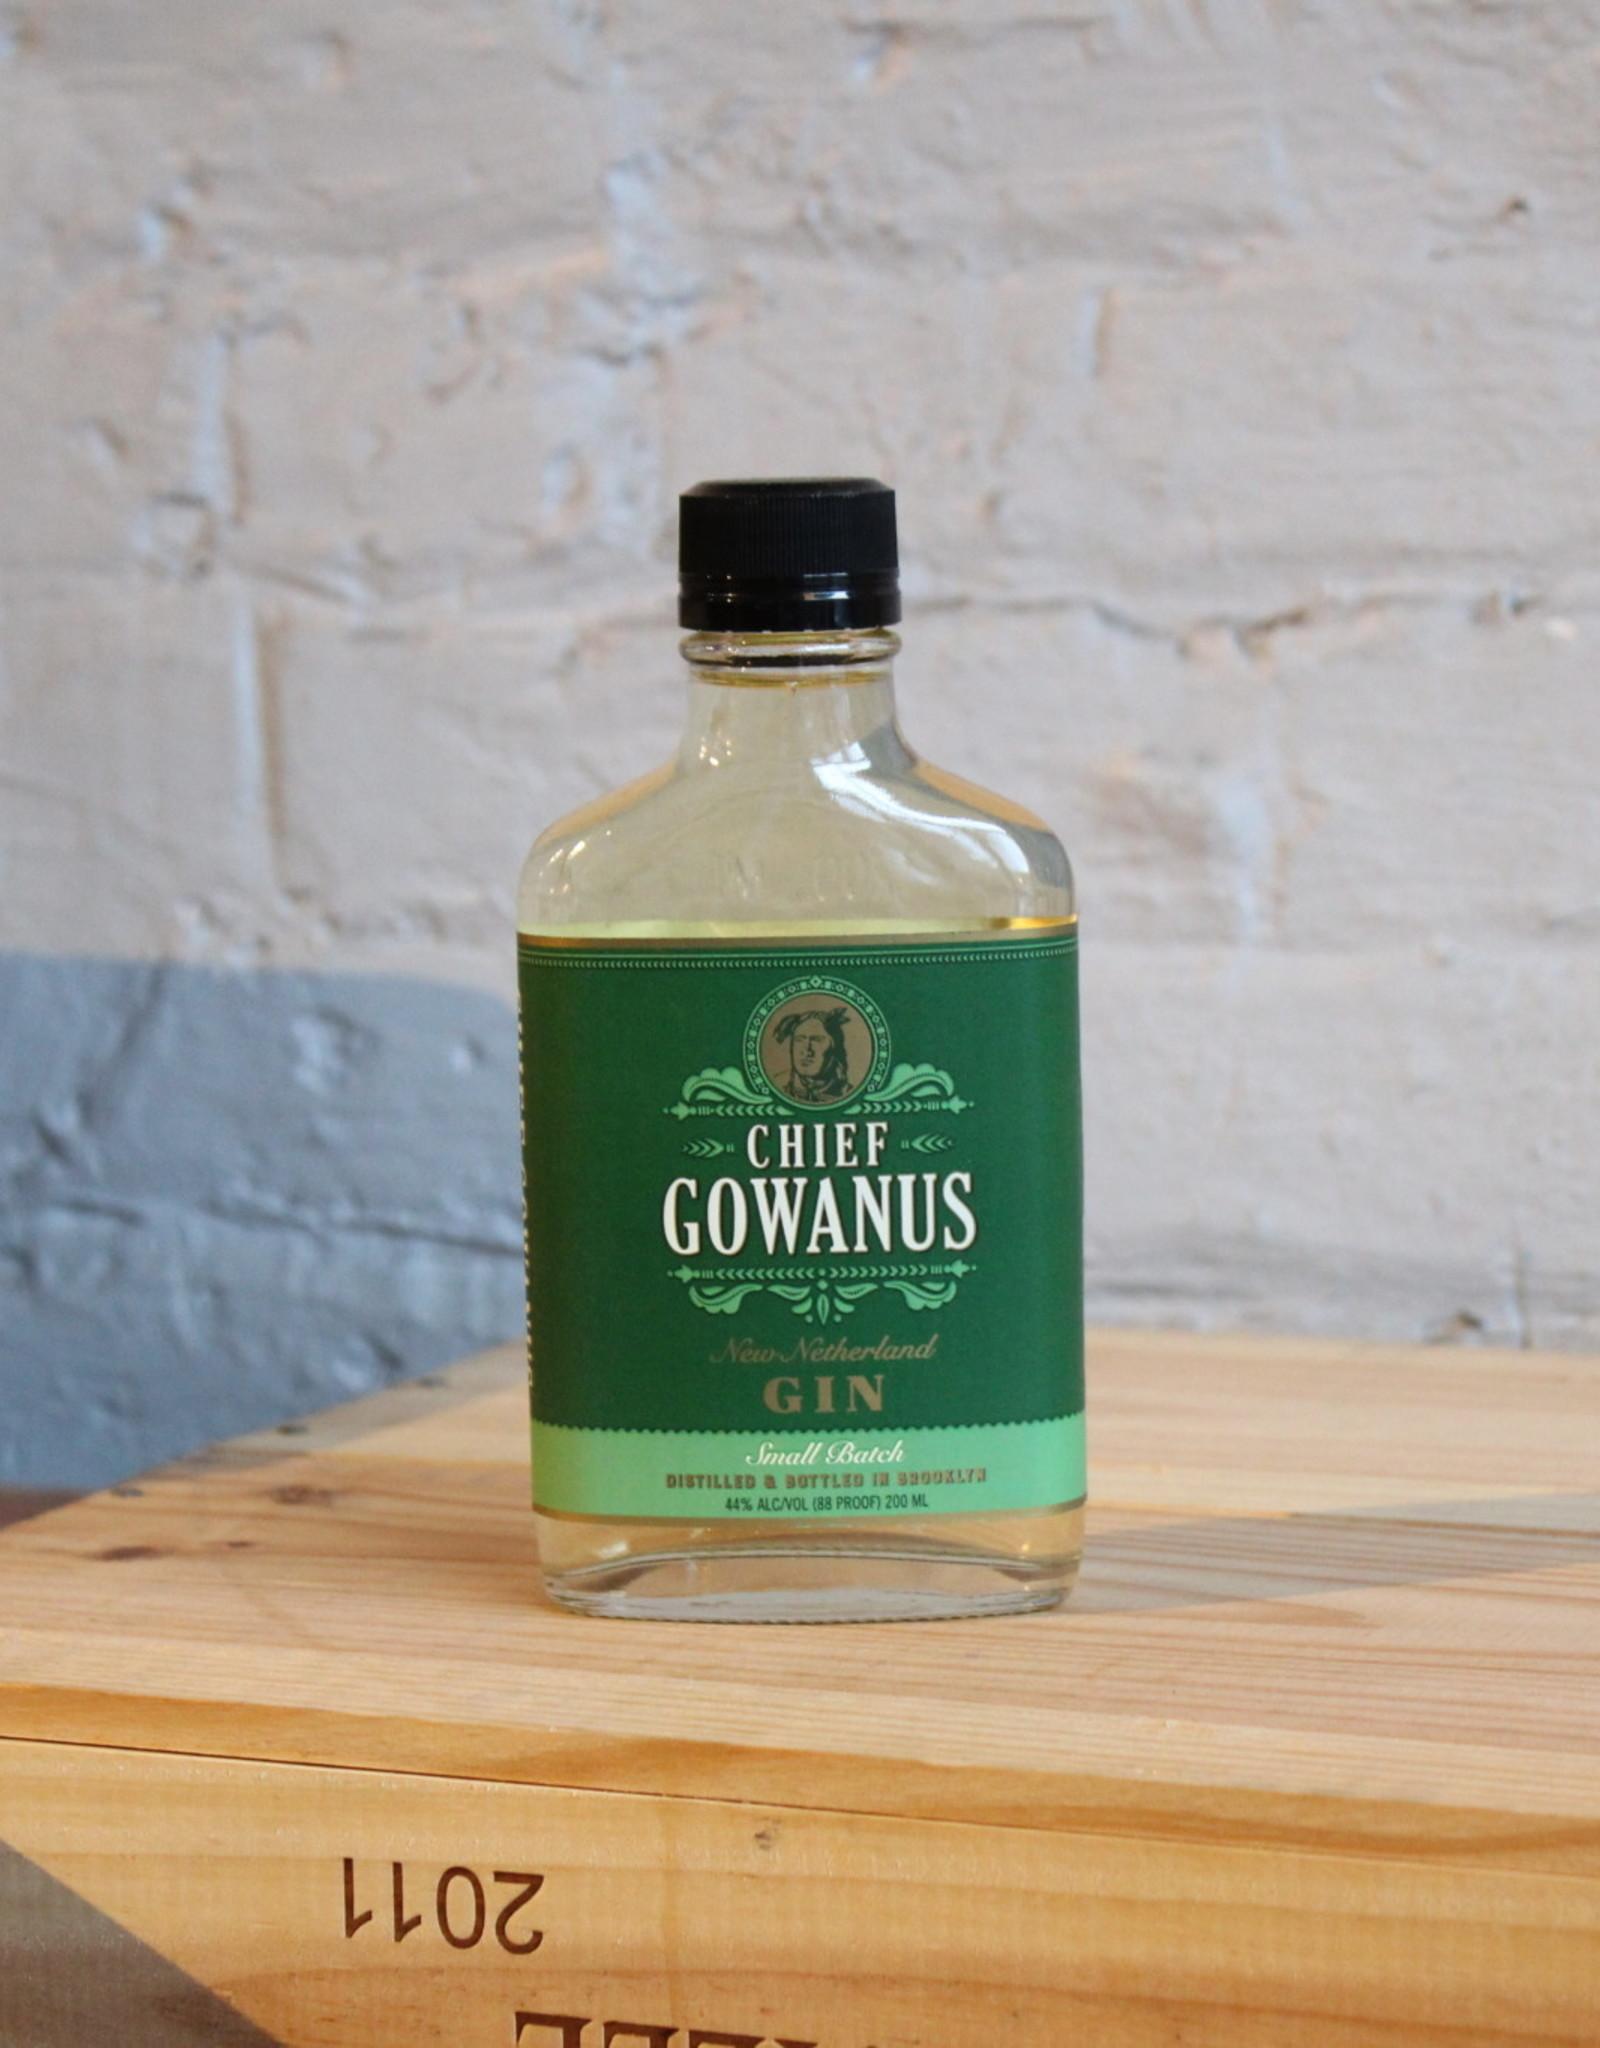 New York Distilling Company 'Chief Gowanus' New Netherland Traditional Gin - Brooklyn, NY (200ml)